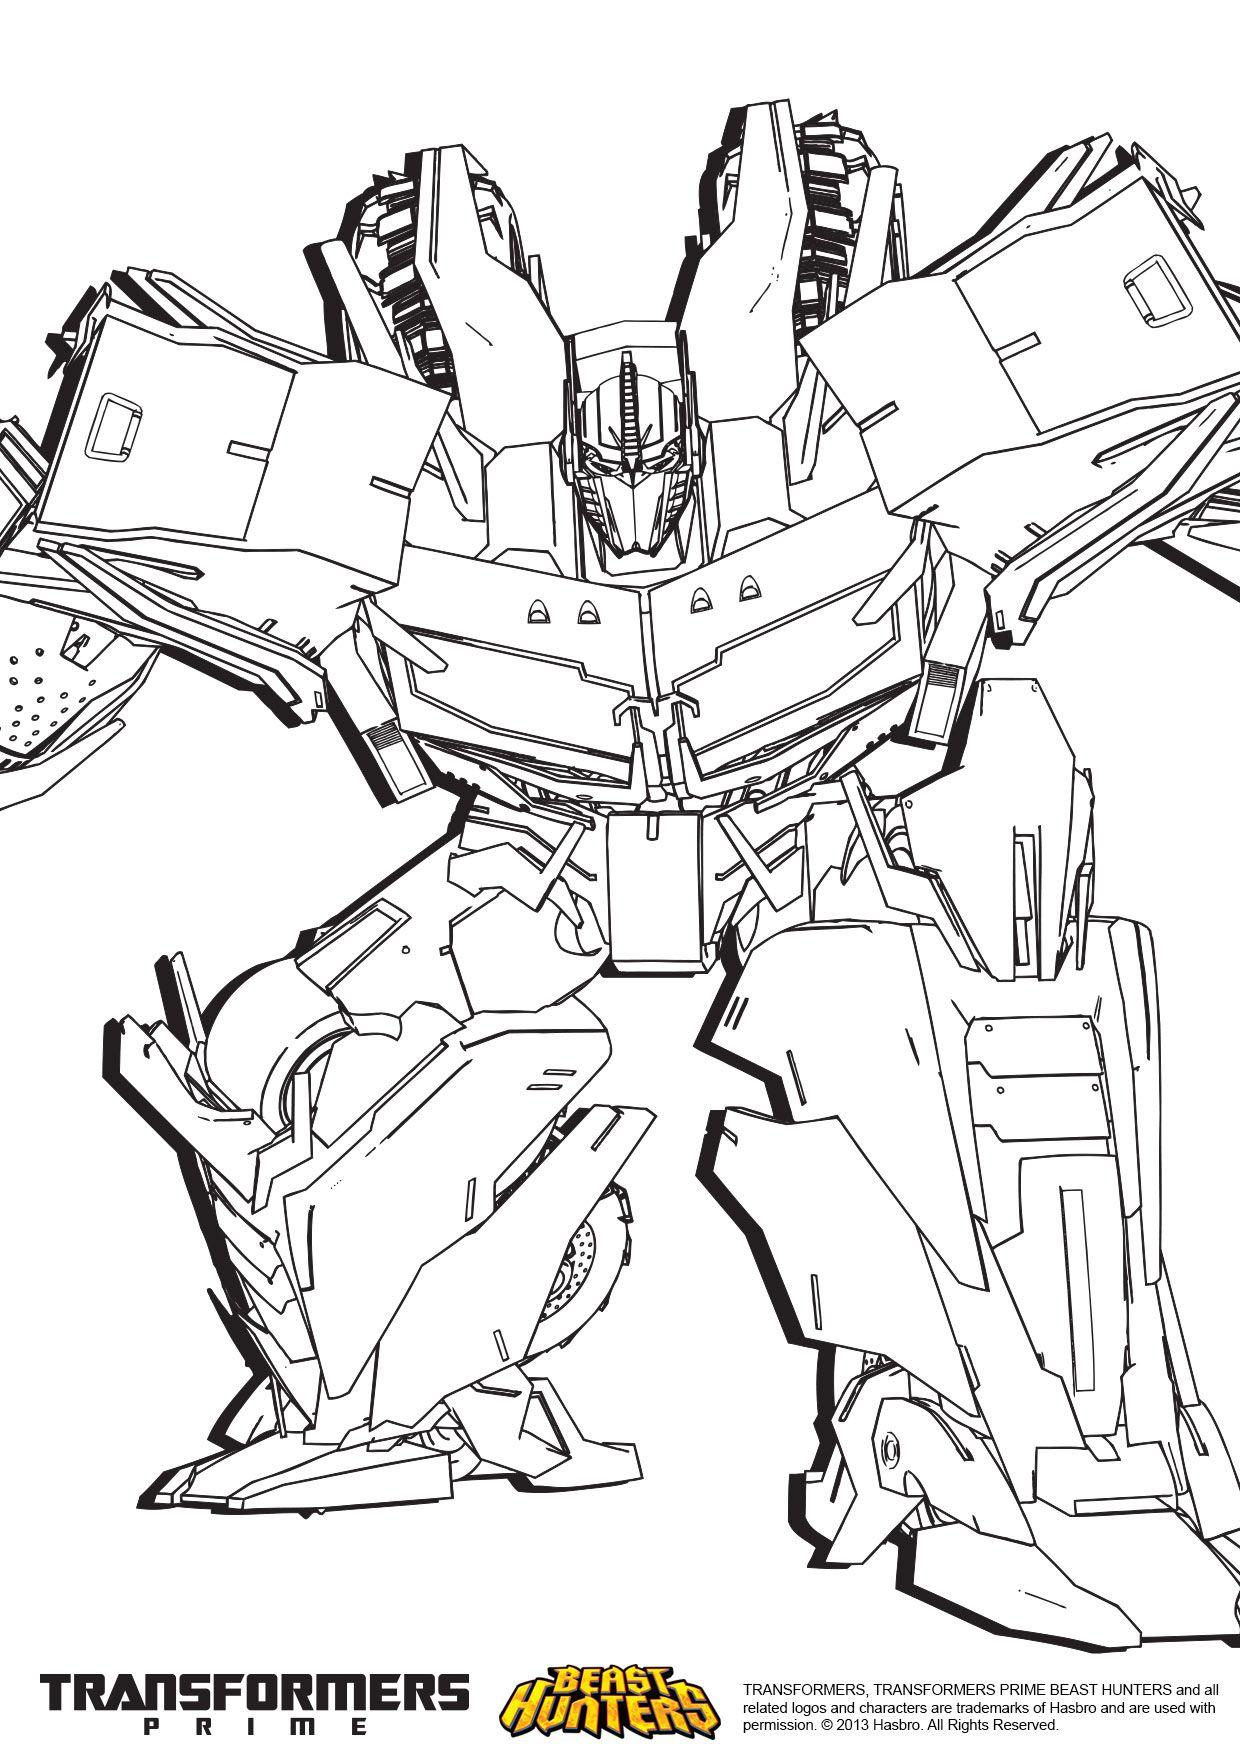 Transformers Prime Beast Hunters Optimus Prime 2 Jpg 1240 1754